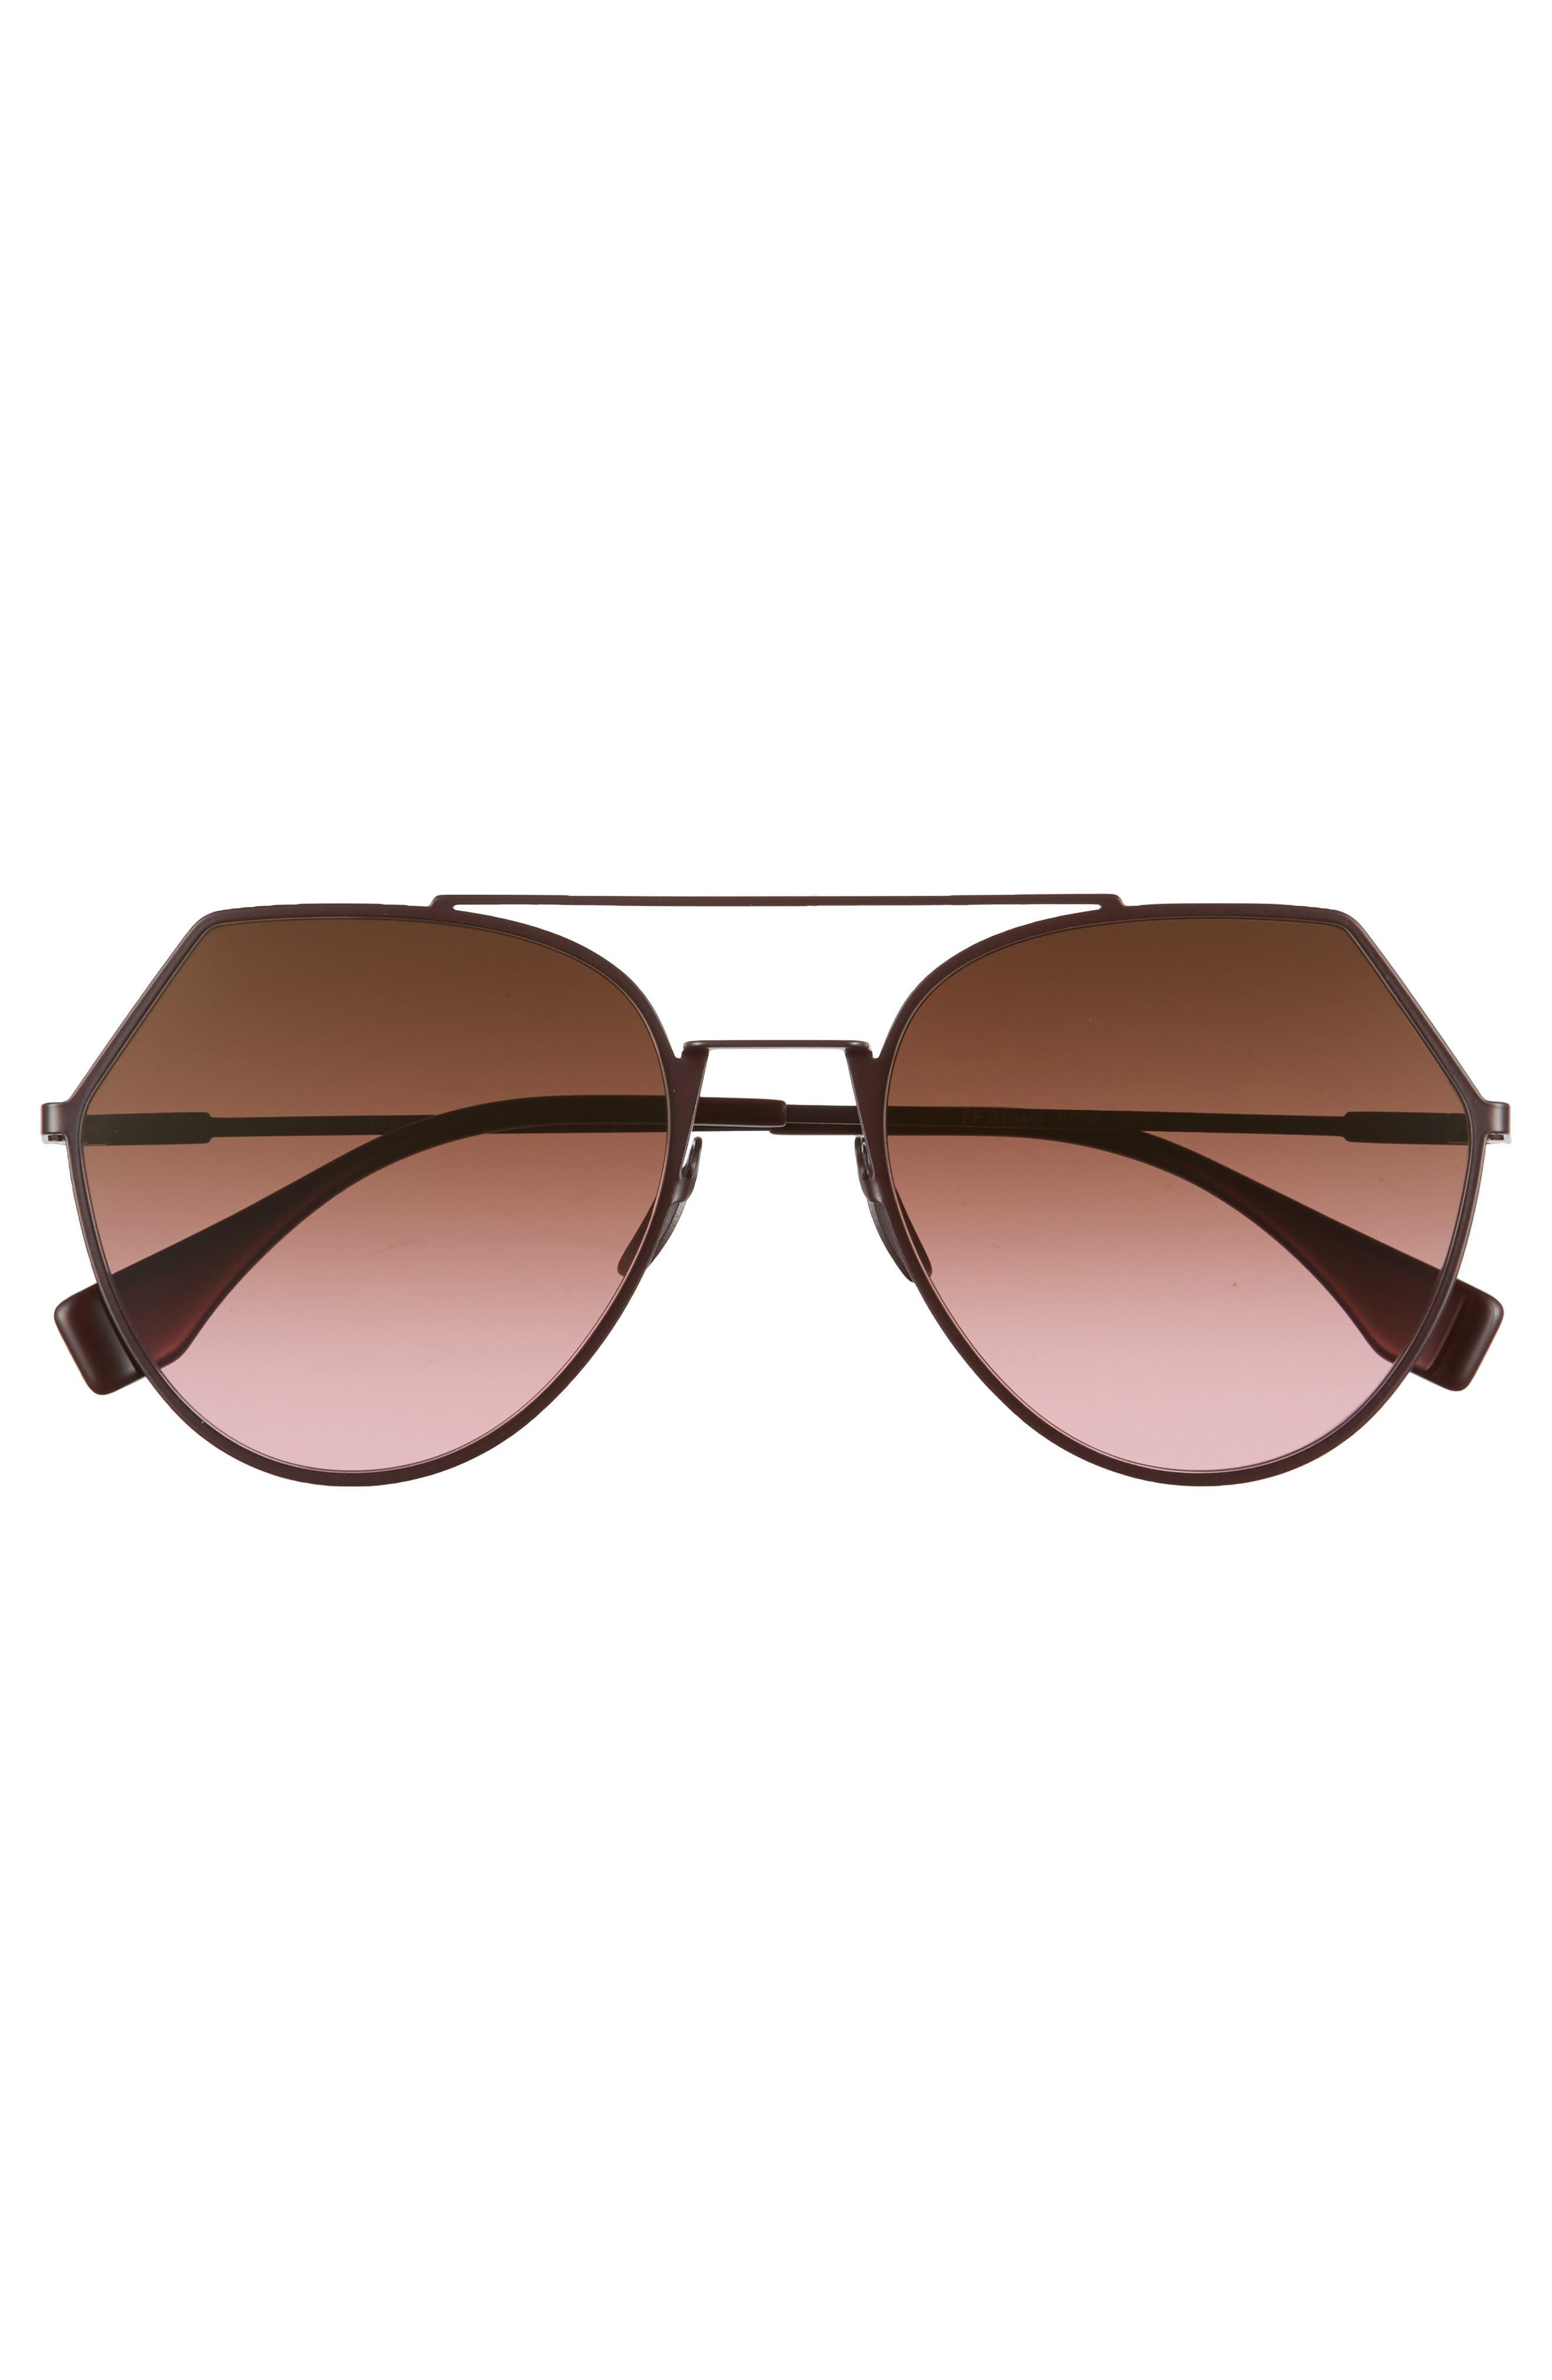 Eyeline 55mm Sunglasses,                             Alternate thumbnail 3, color,                             PLUM